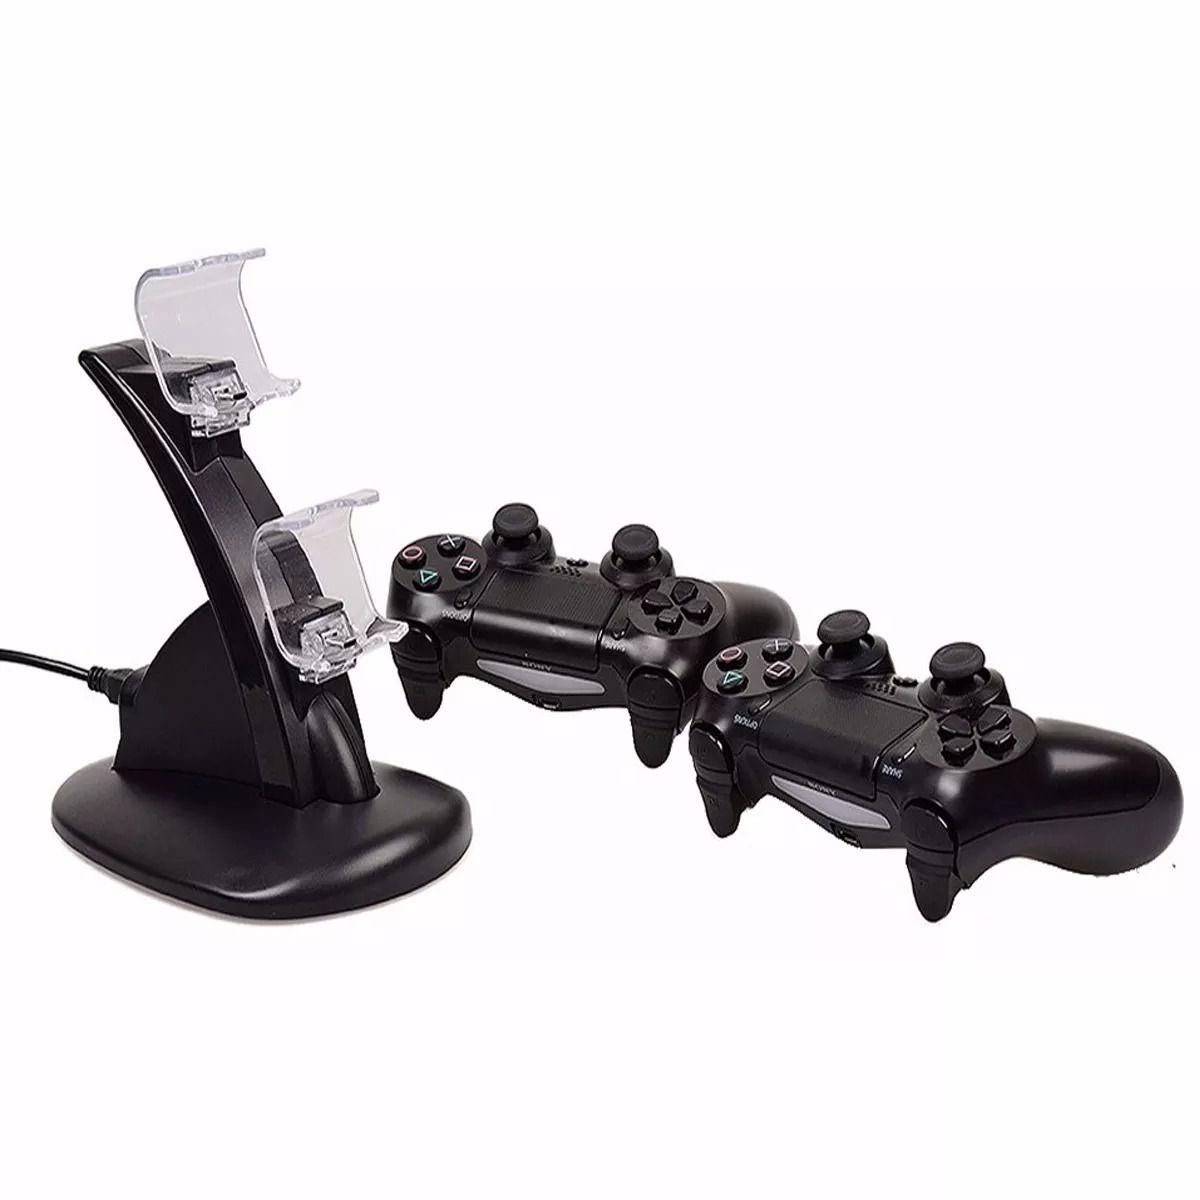 Suporte Carregador Ps4 Joystick Duplo Controle Dualshock 4 Playstation 4